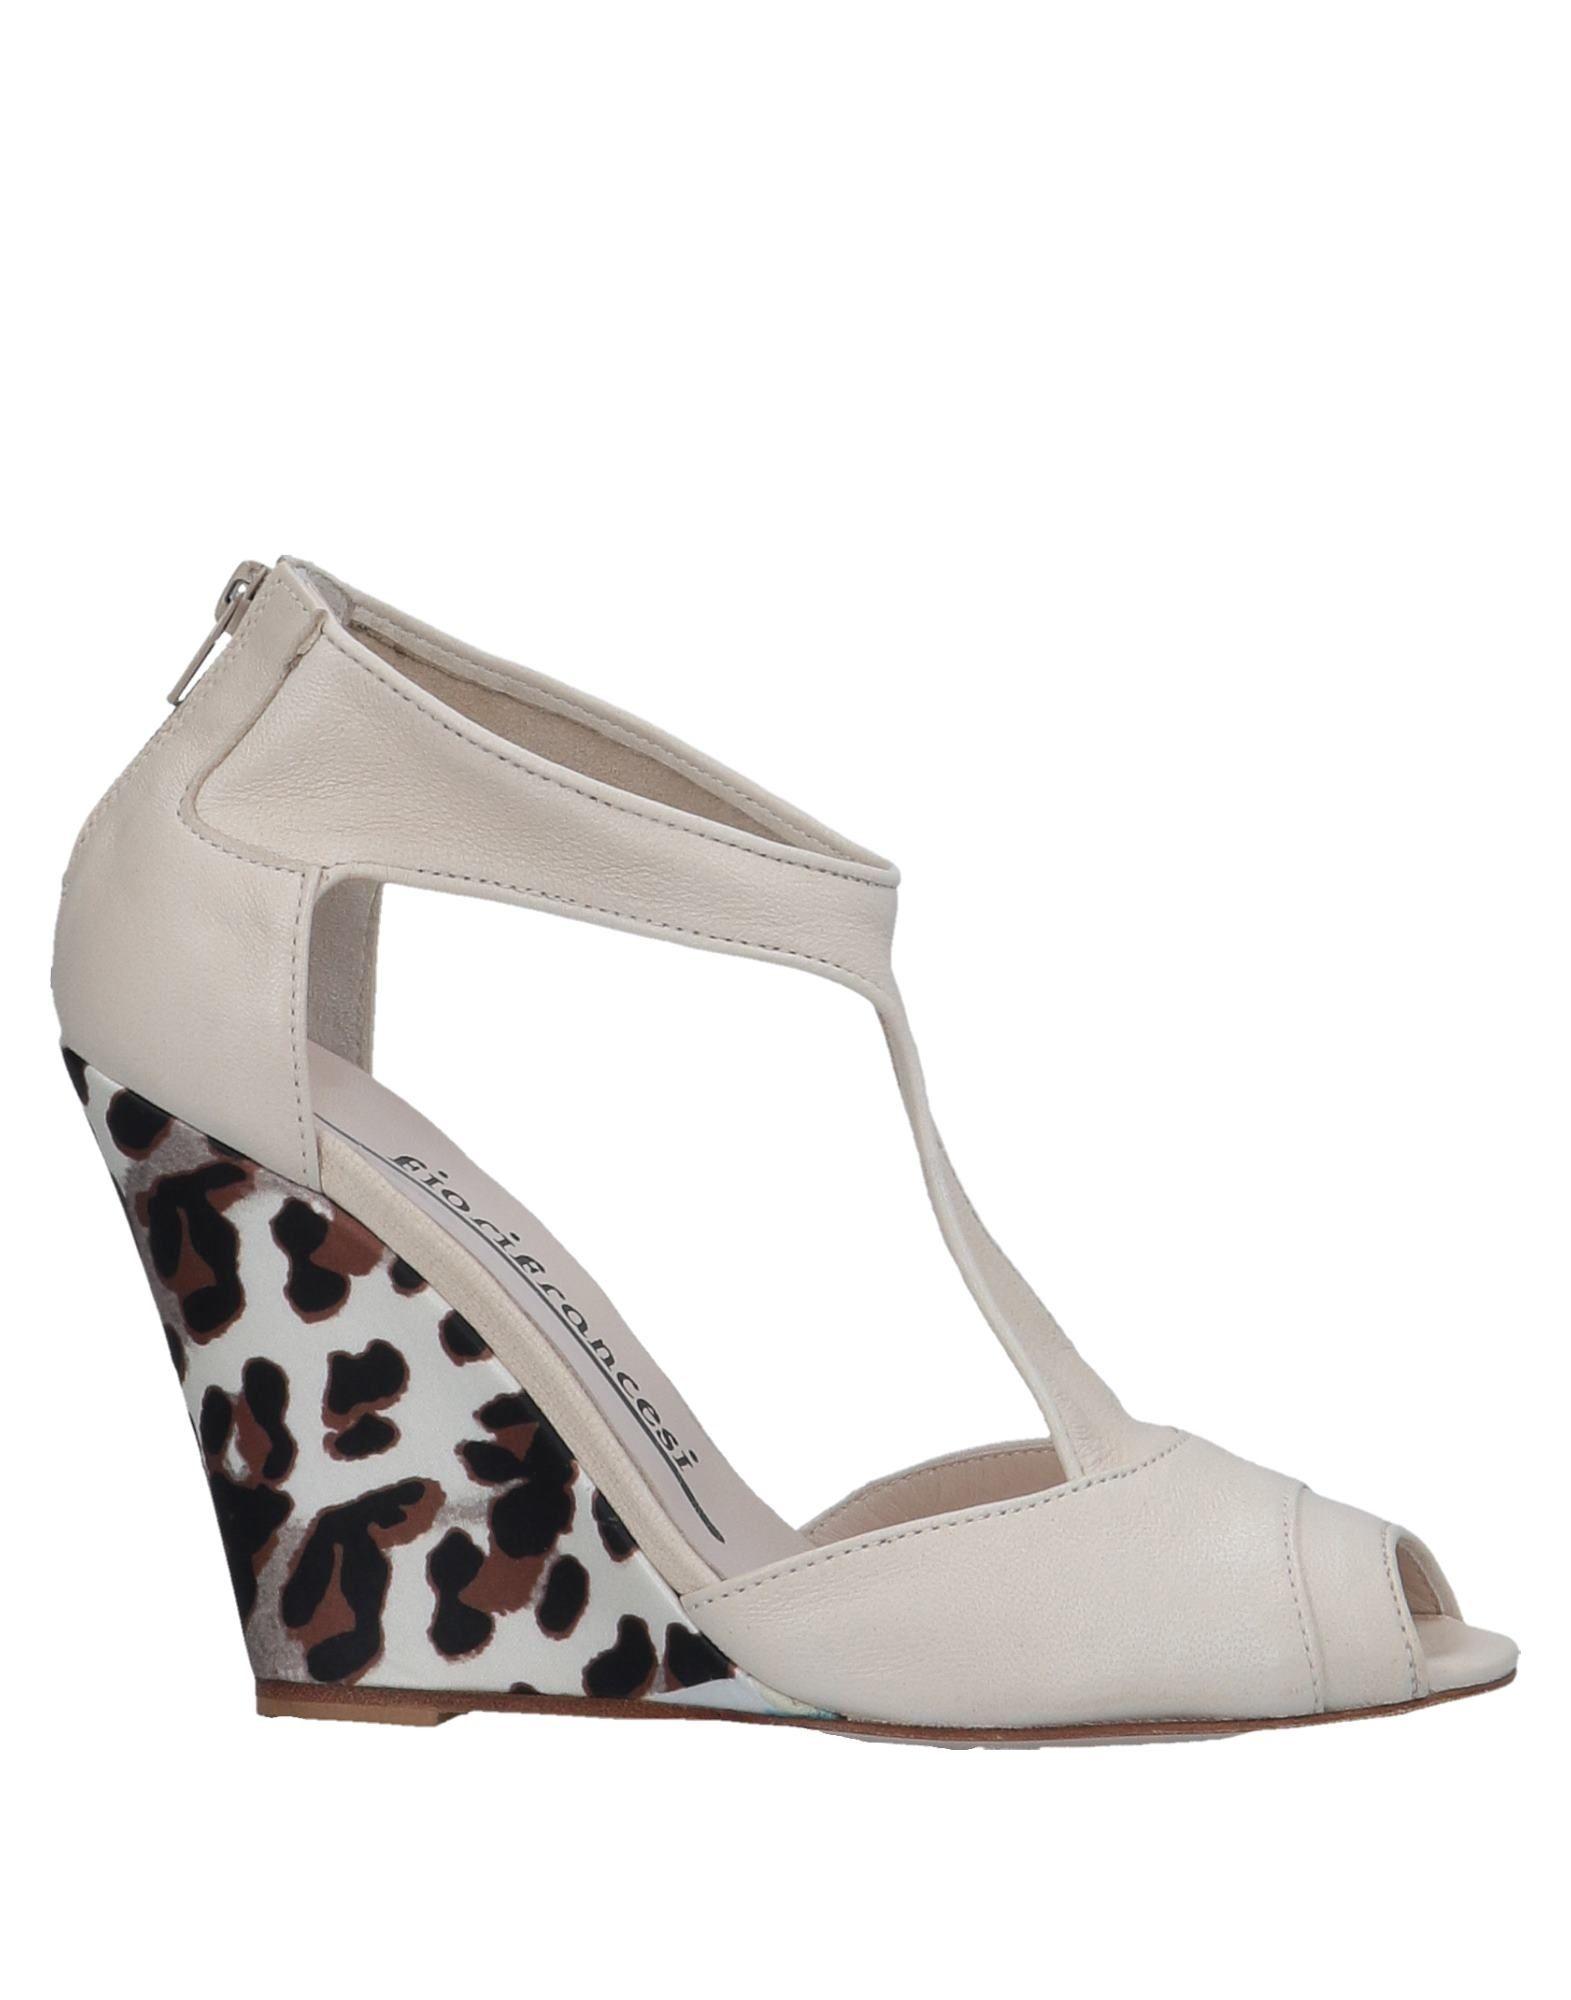 Fiorifrancesi Sandals - Women Fiorifrancesi Sandals online on    United Kingdom - 11544813LH 119c55